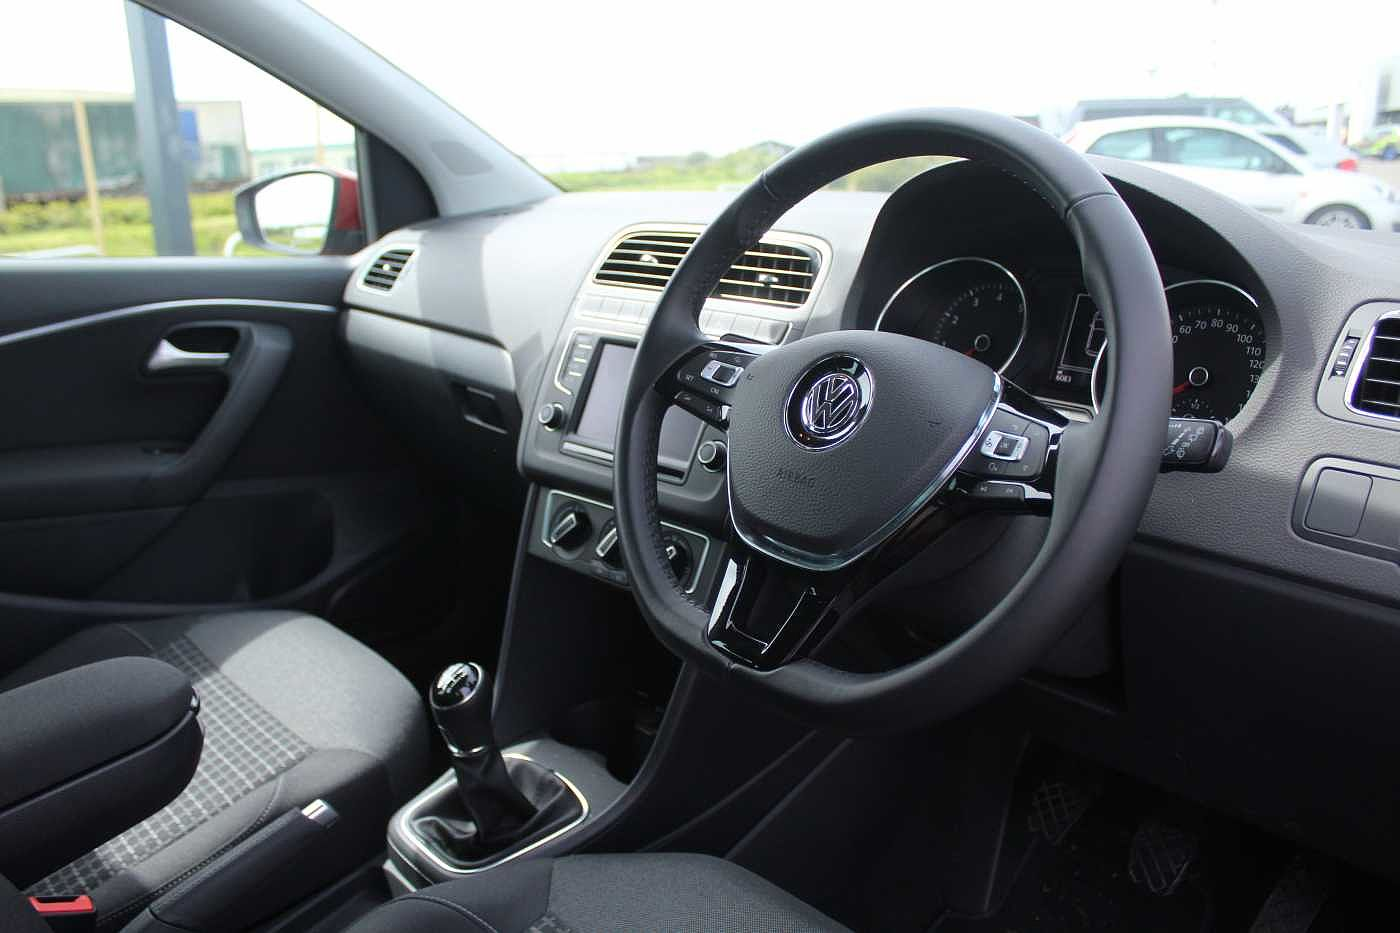 Volkswagen Polo 1.2 TSI SEL 110PS 5Dr